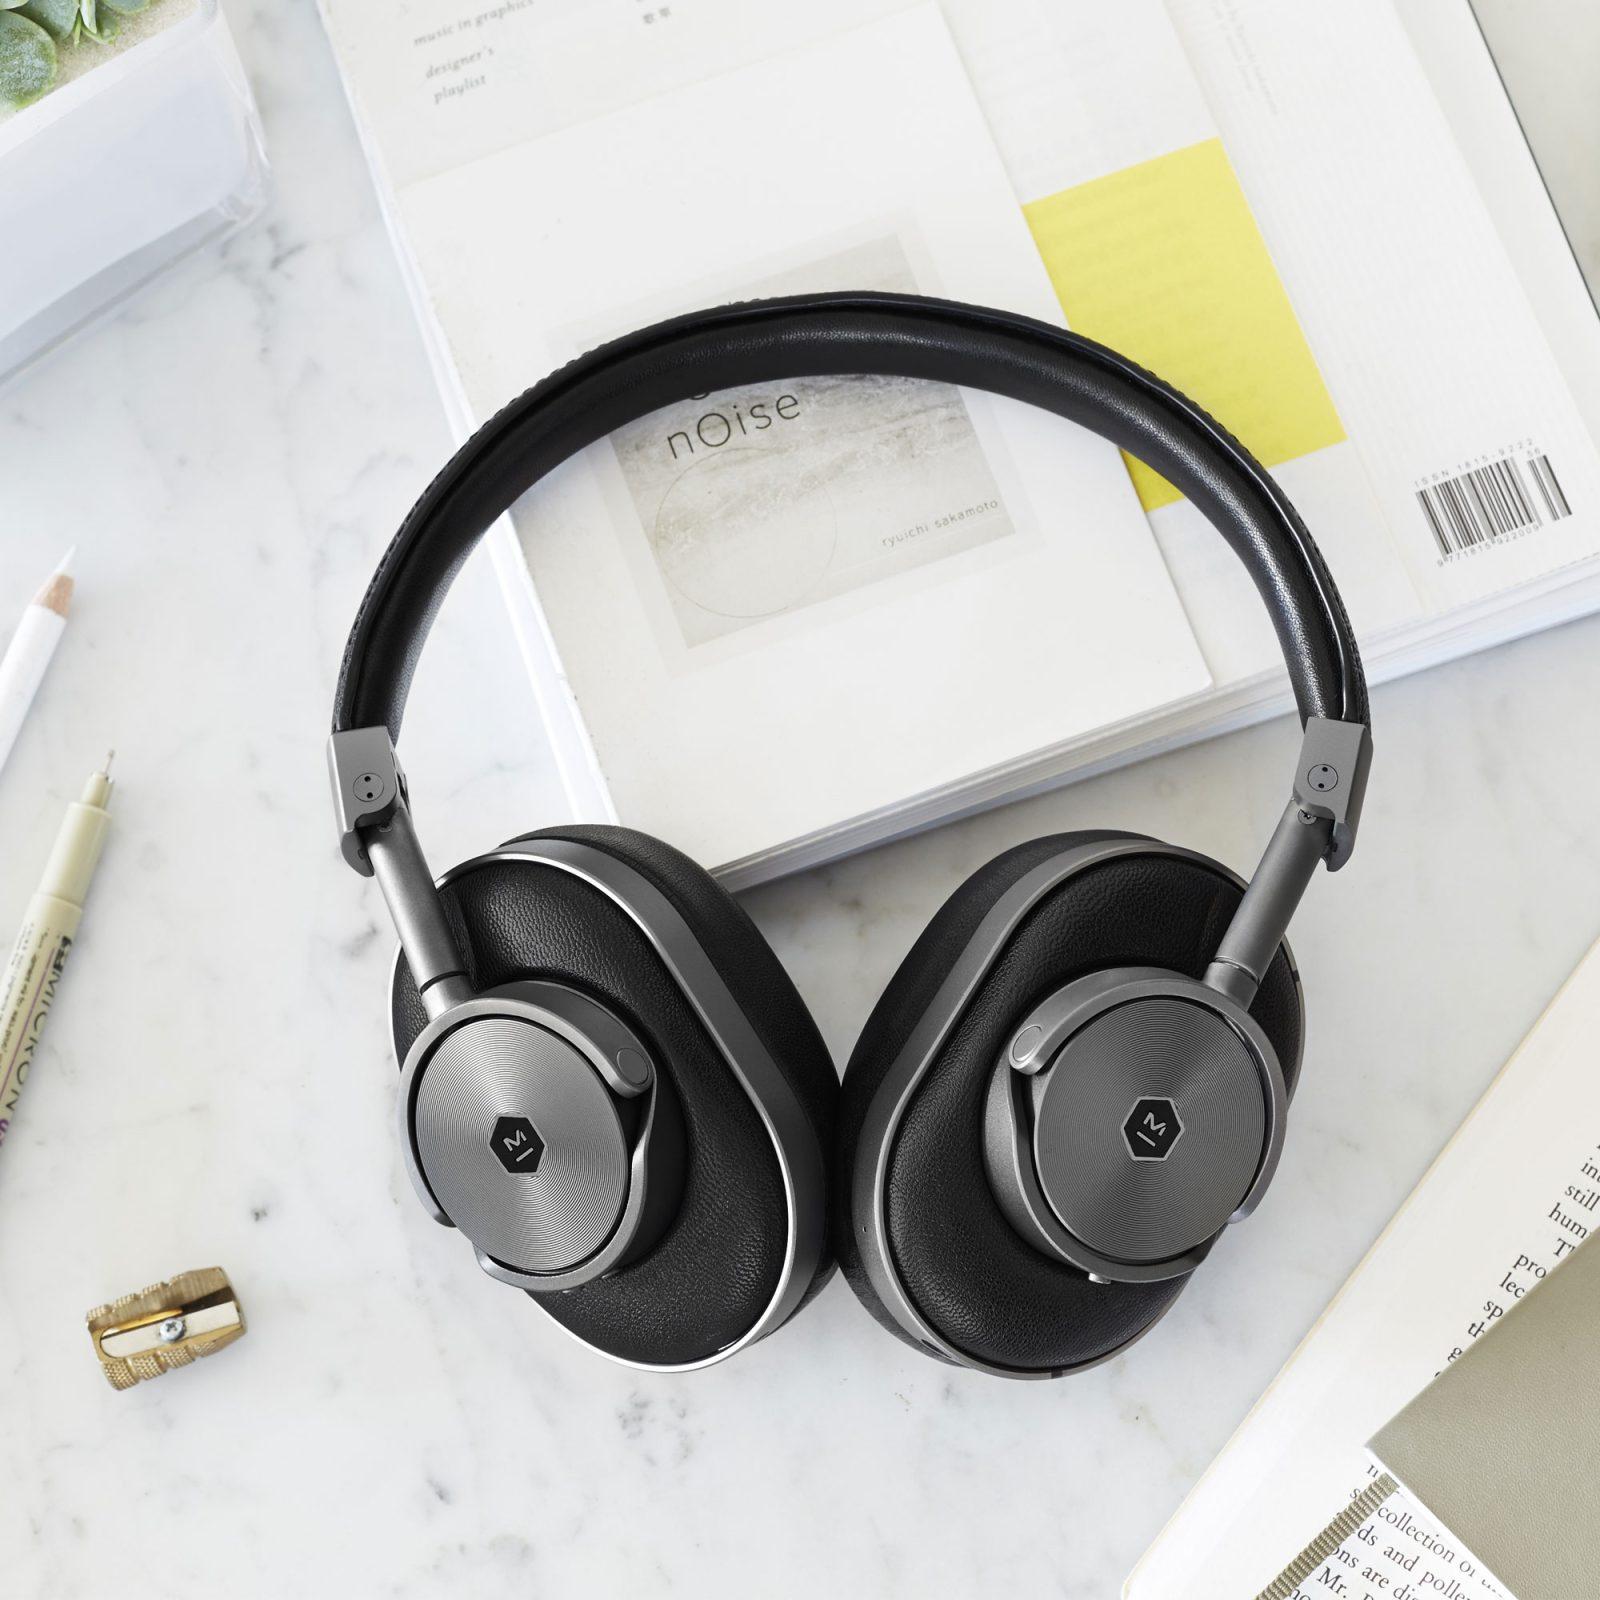 mw60-wireless-over-ear-headphones-gunmetal-10